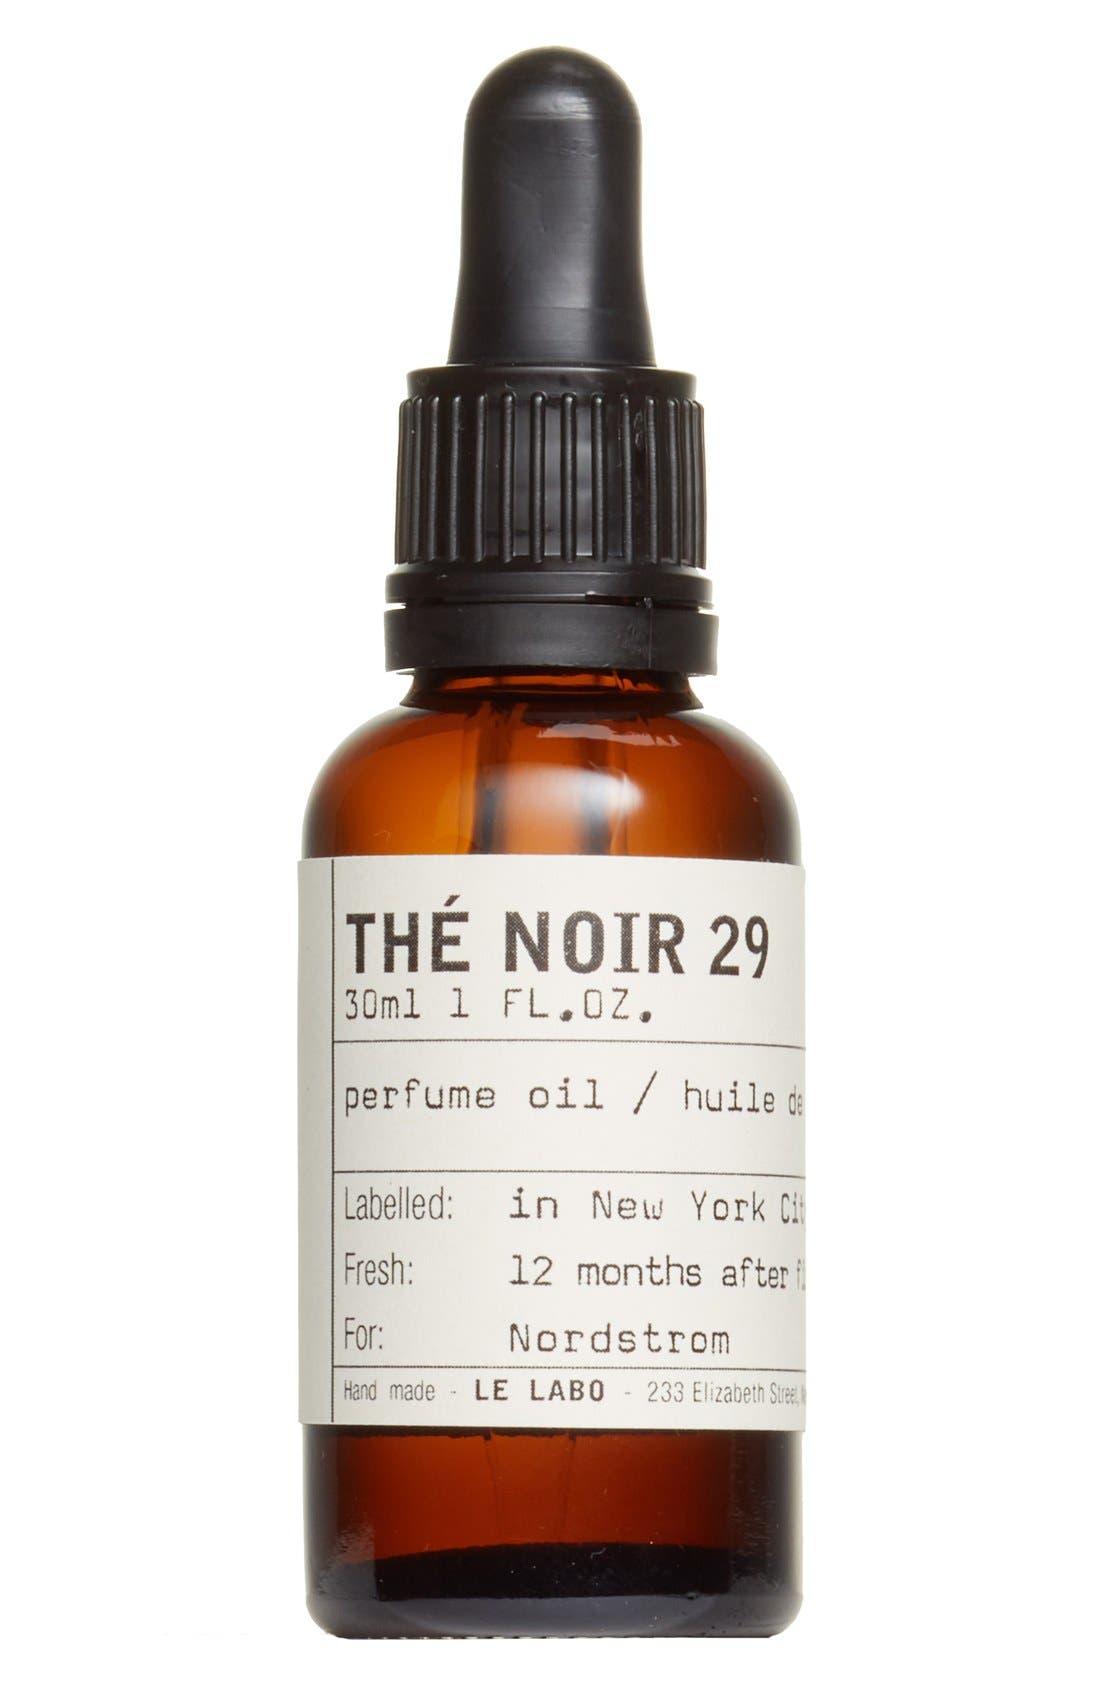 Le Labo 'The Noir 29' Perfume Oil